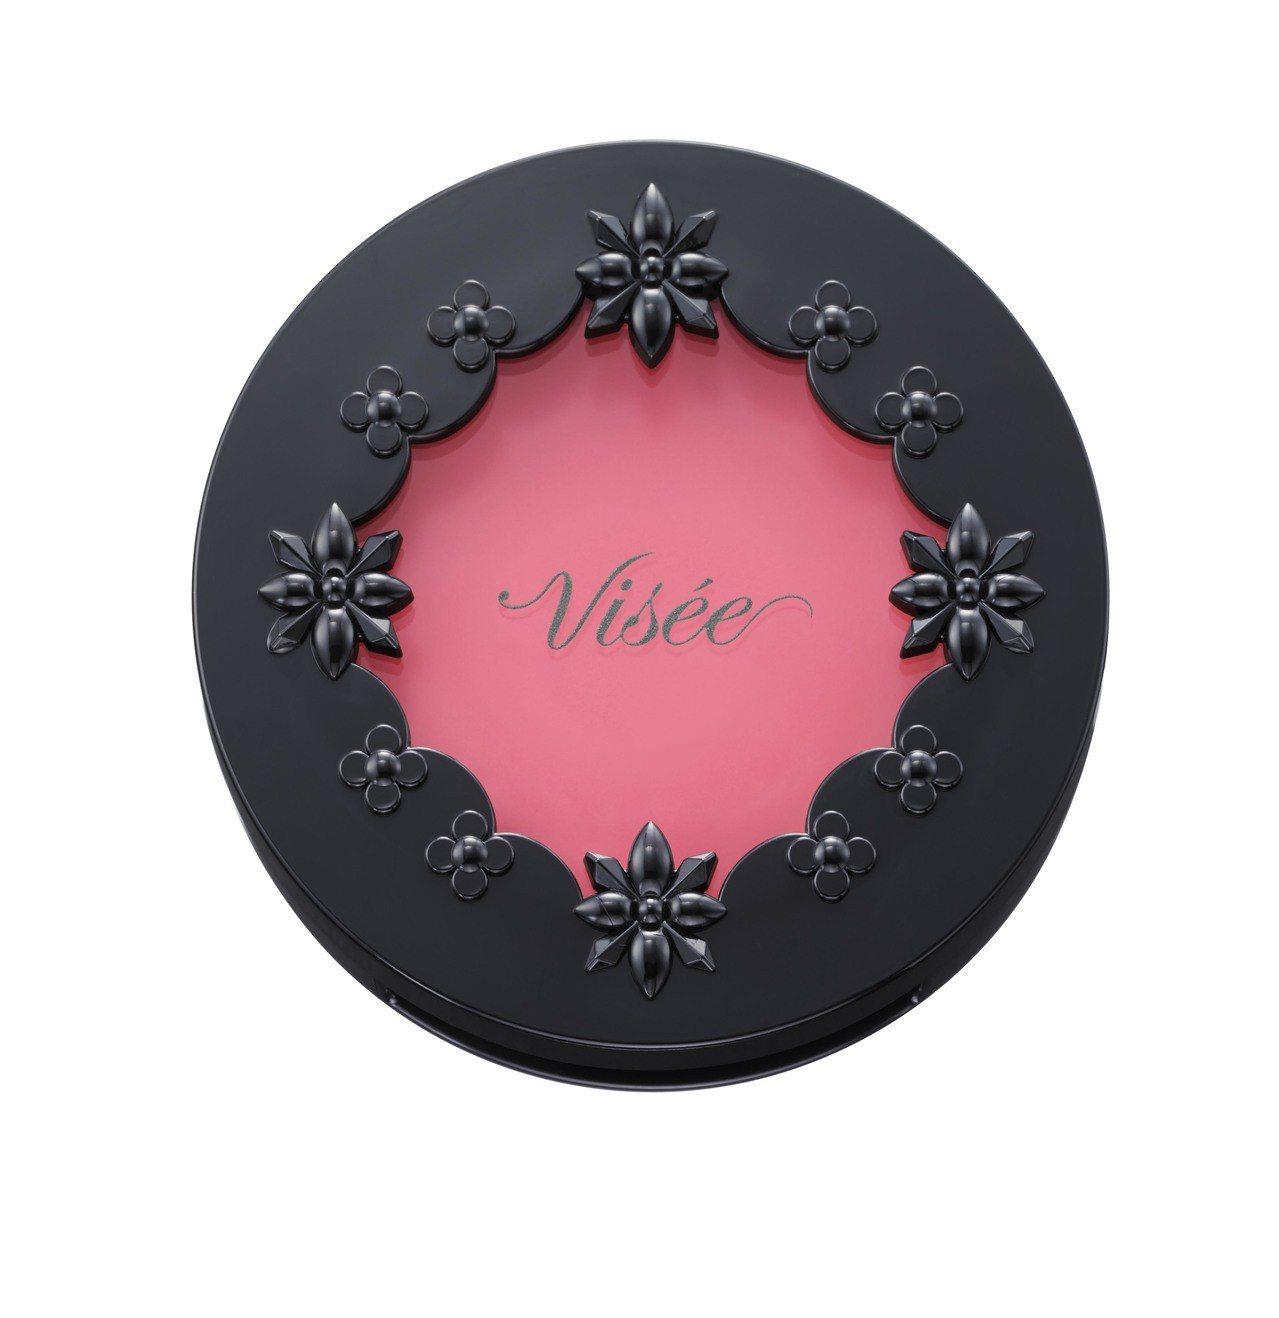 Visee純真唇頰彩,售價280元,共10色。圖/Visee提供